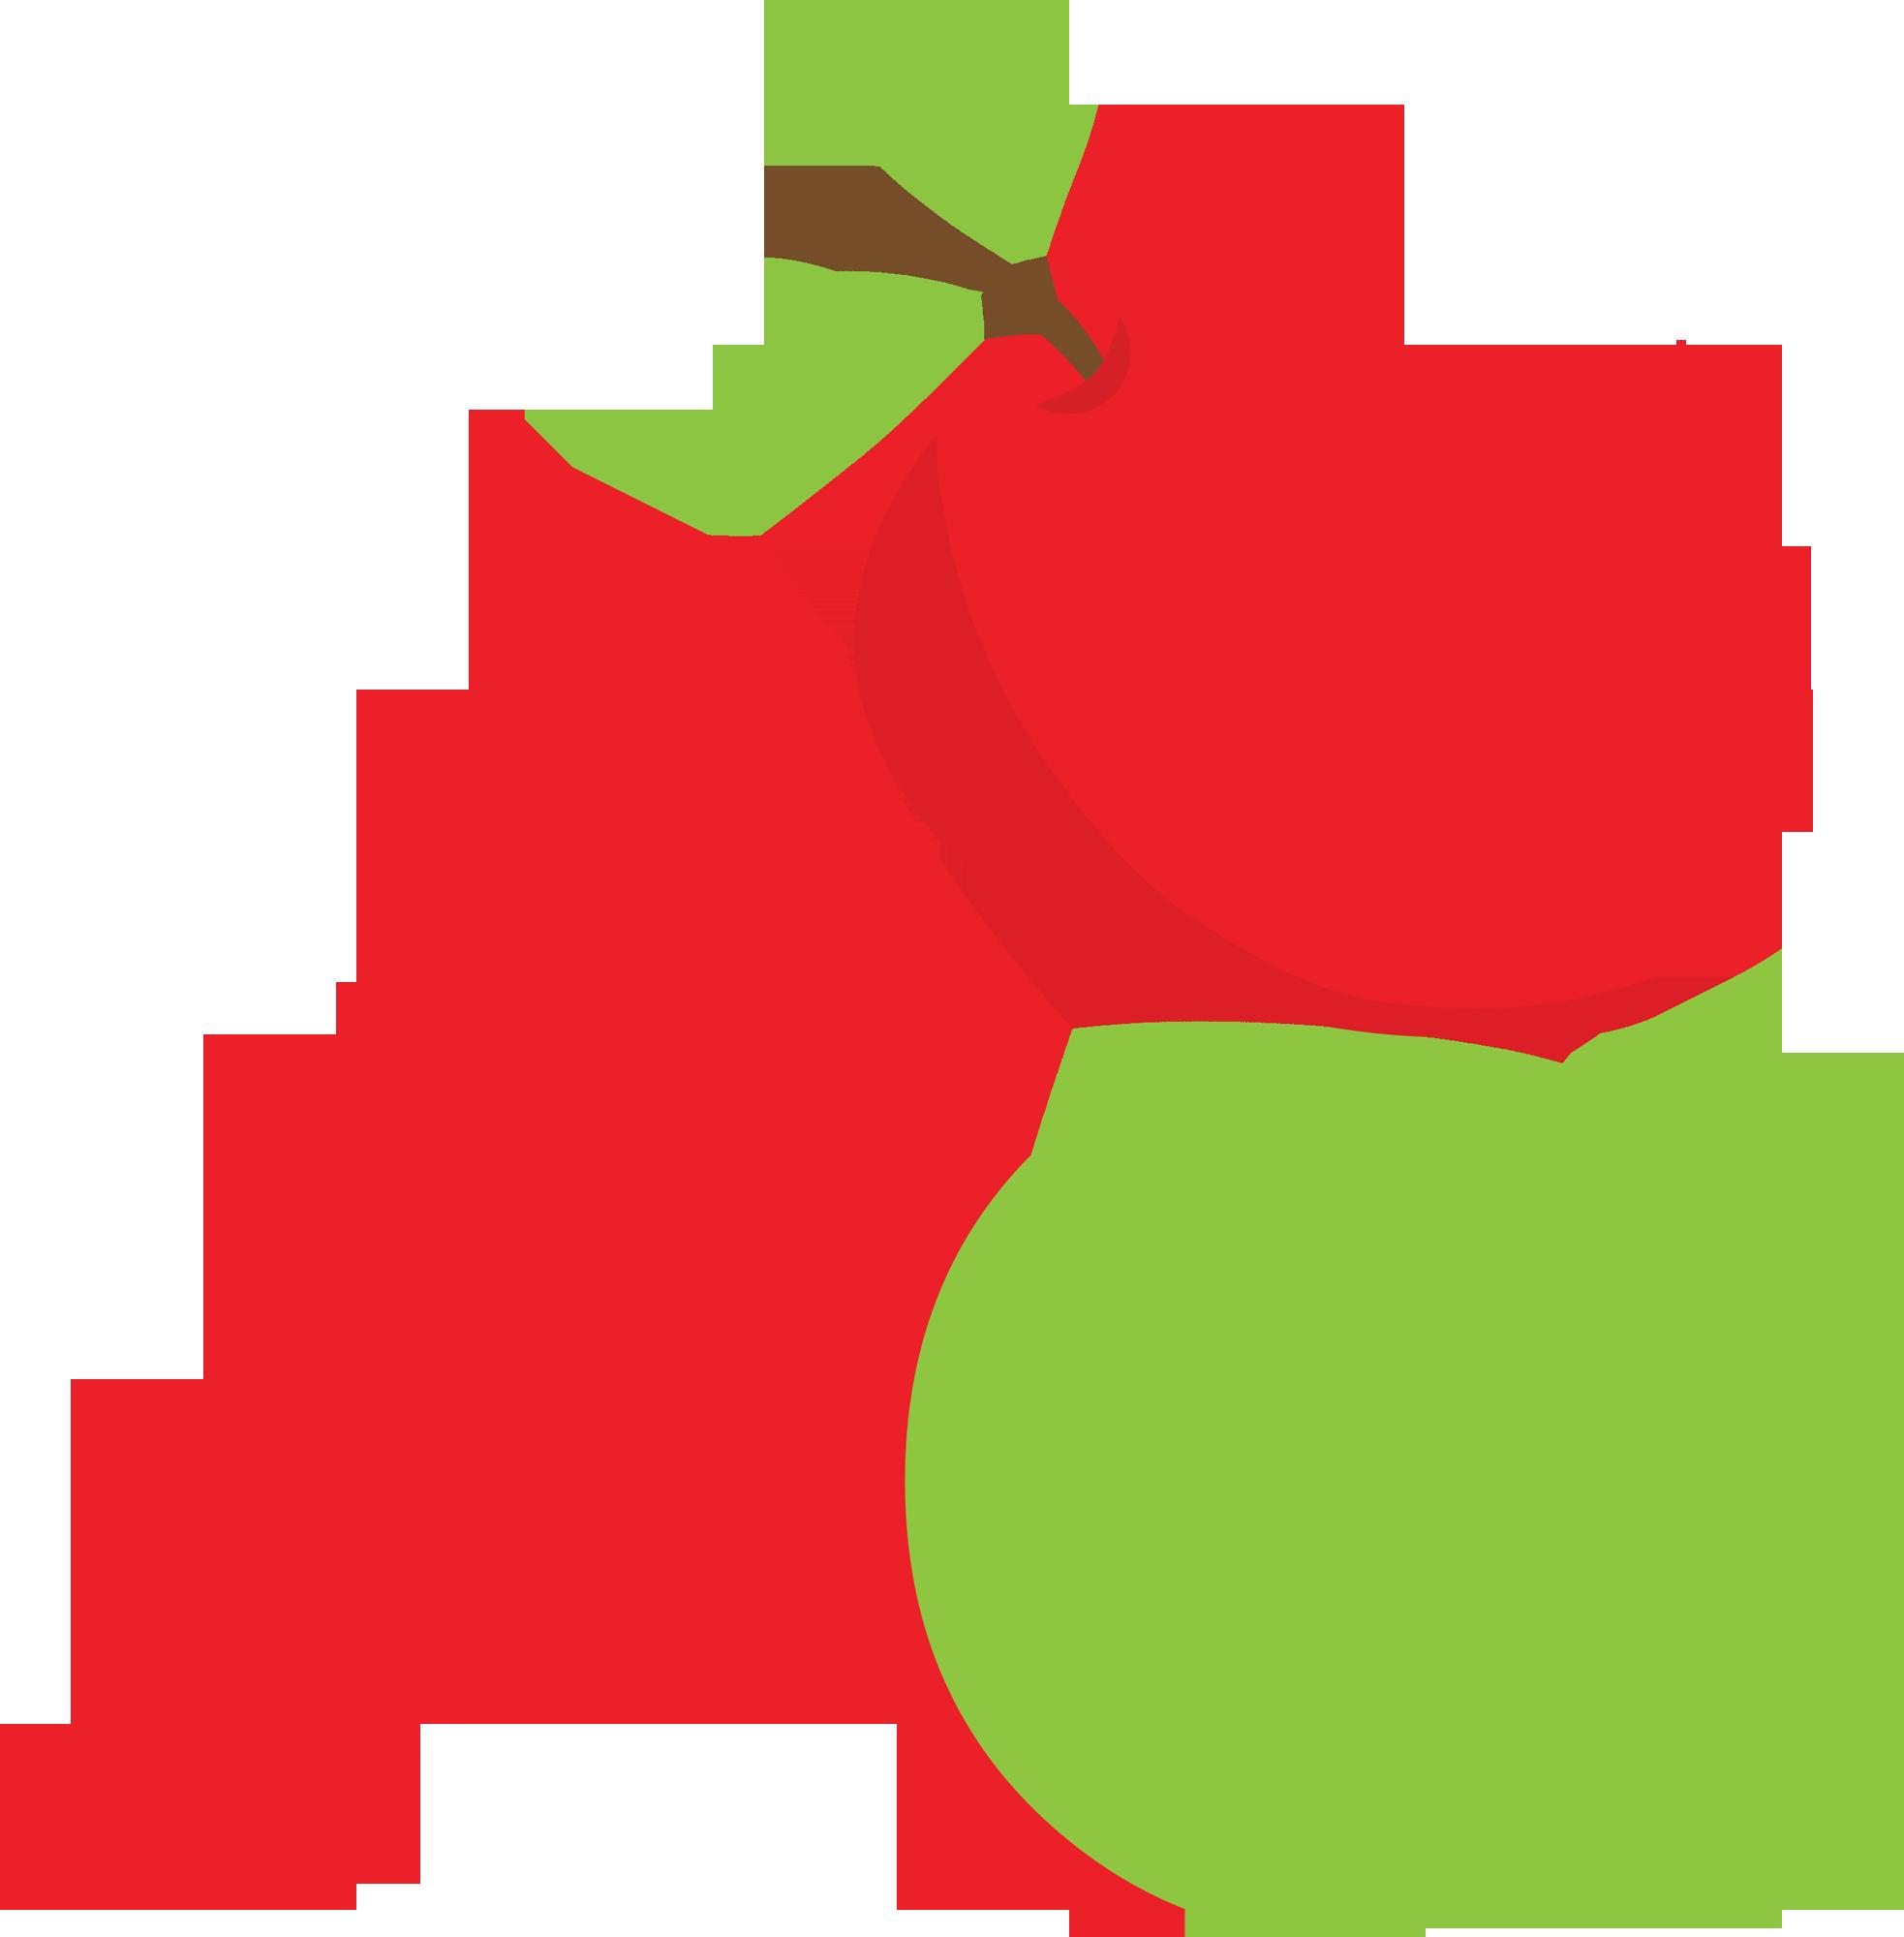 Clipart fruit alphabet. Love letters homeschooled kids